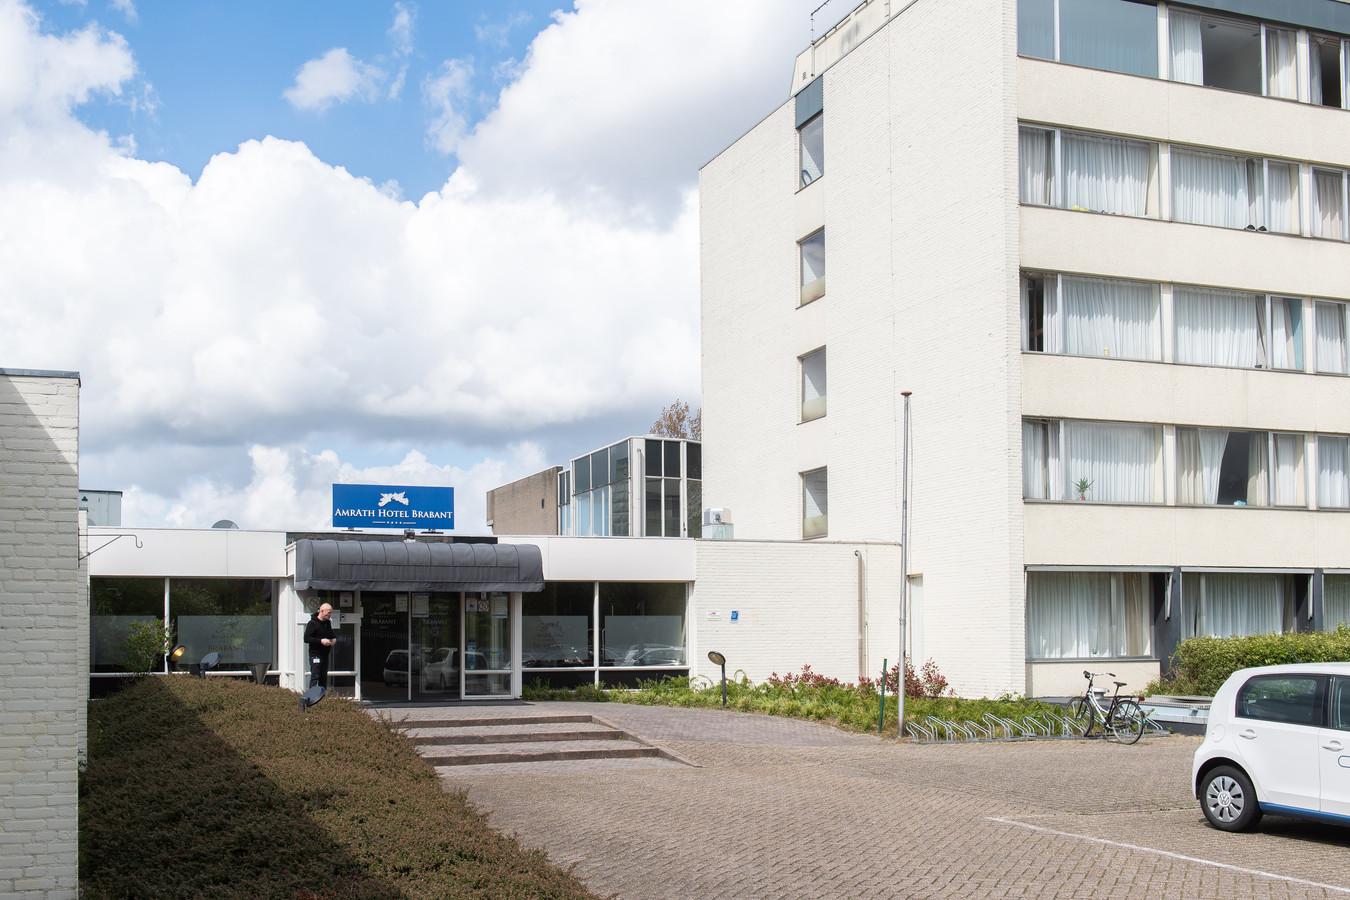 Ingang Amrâth Hotel aan de Heerbaan in Breda.